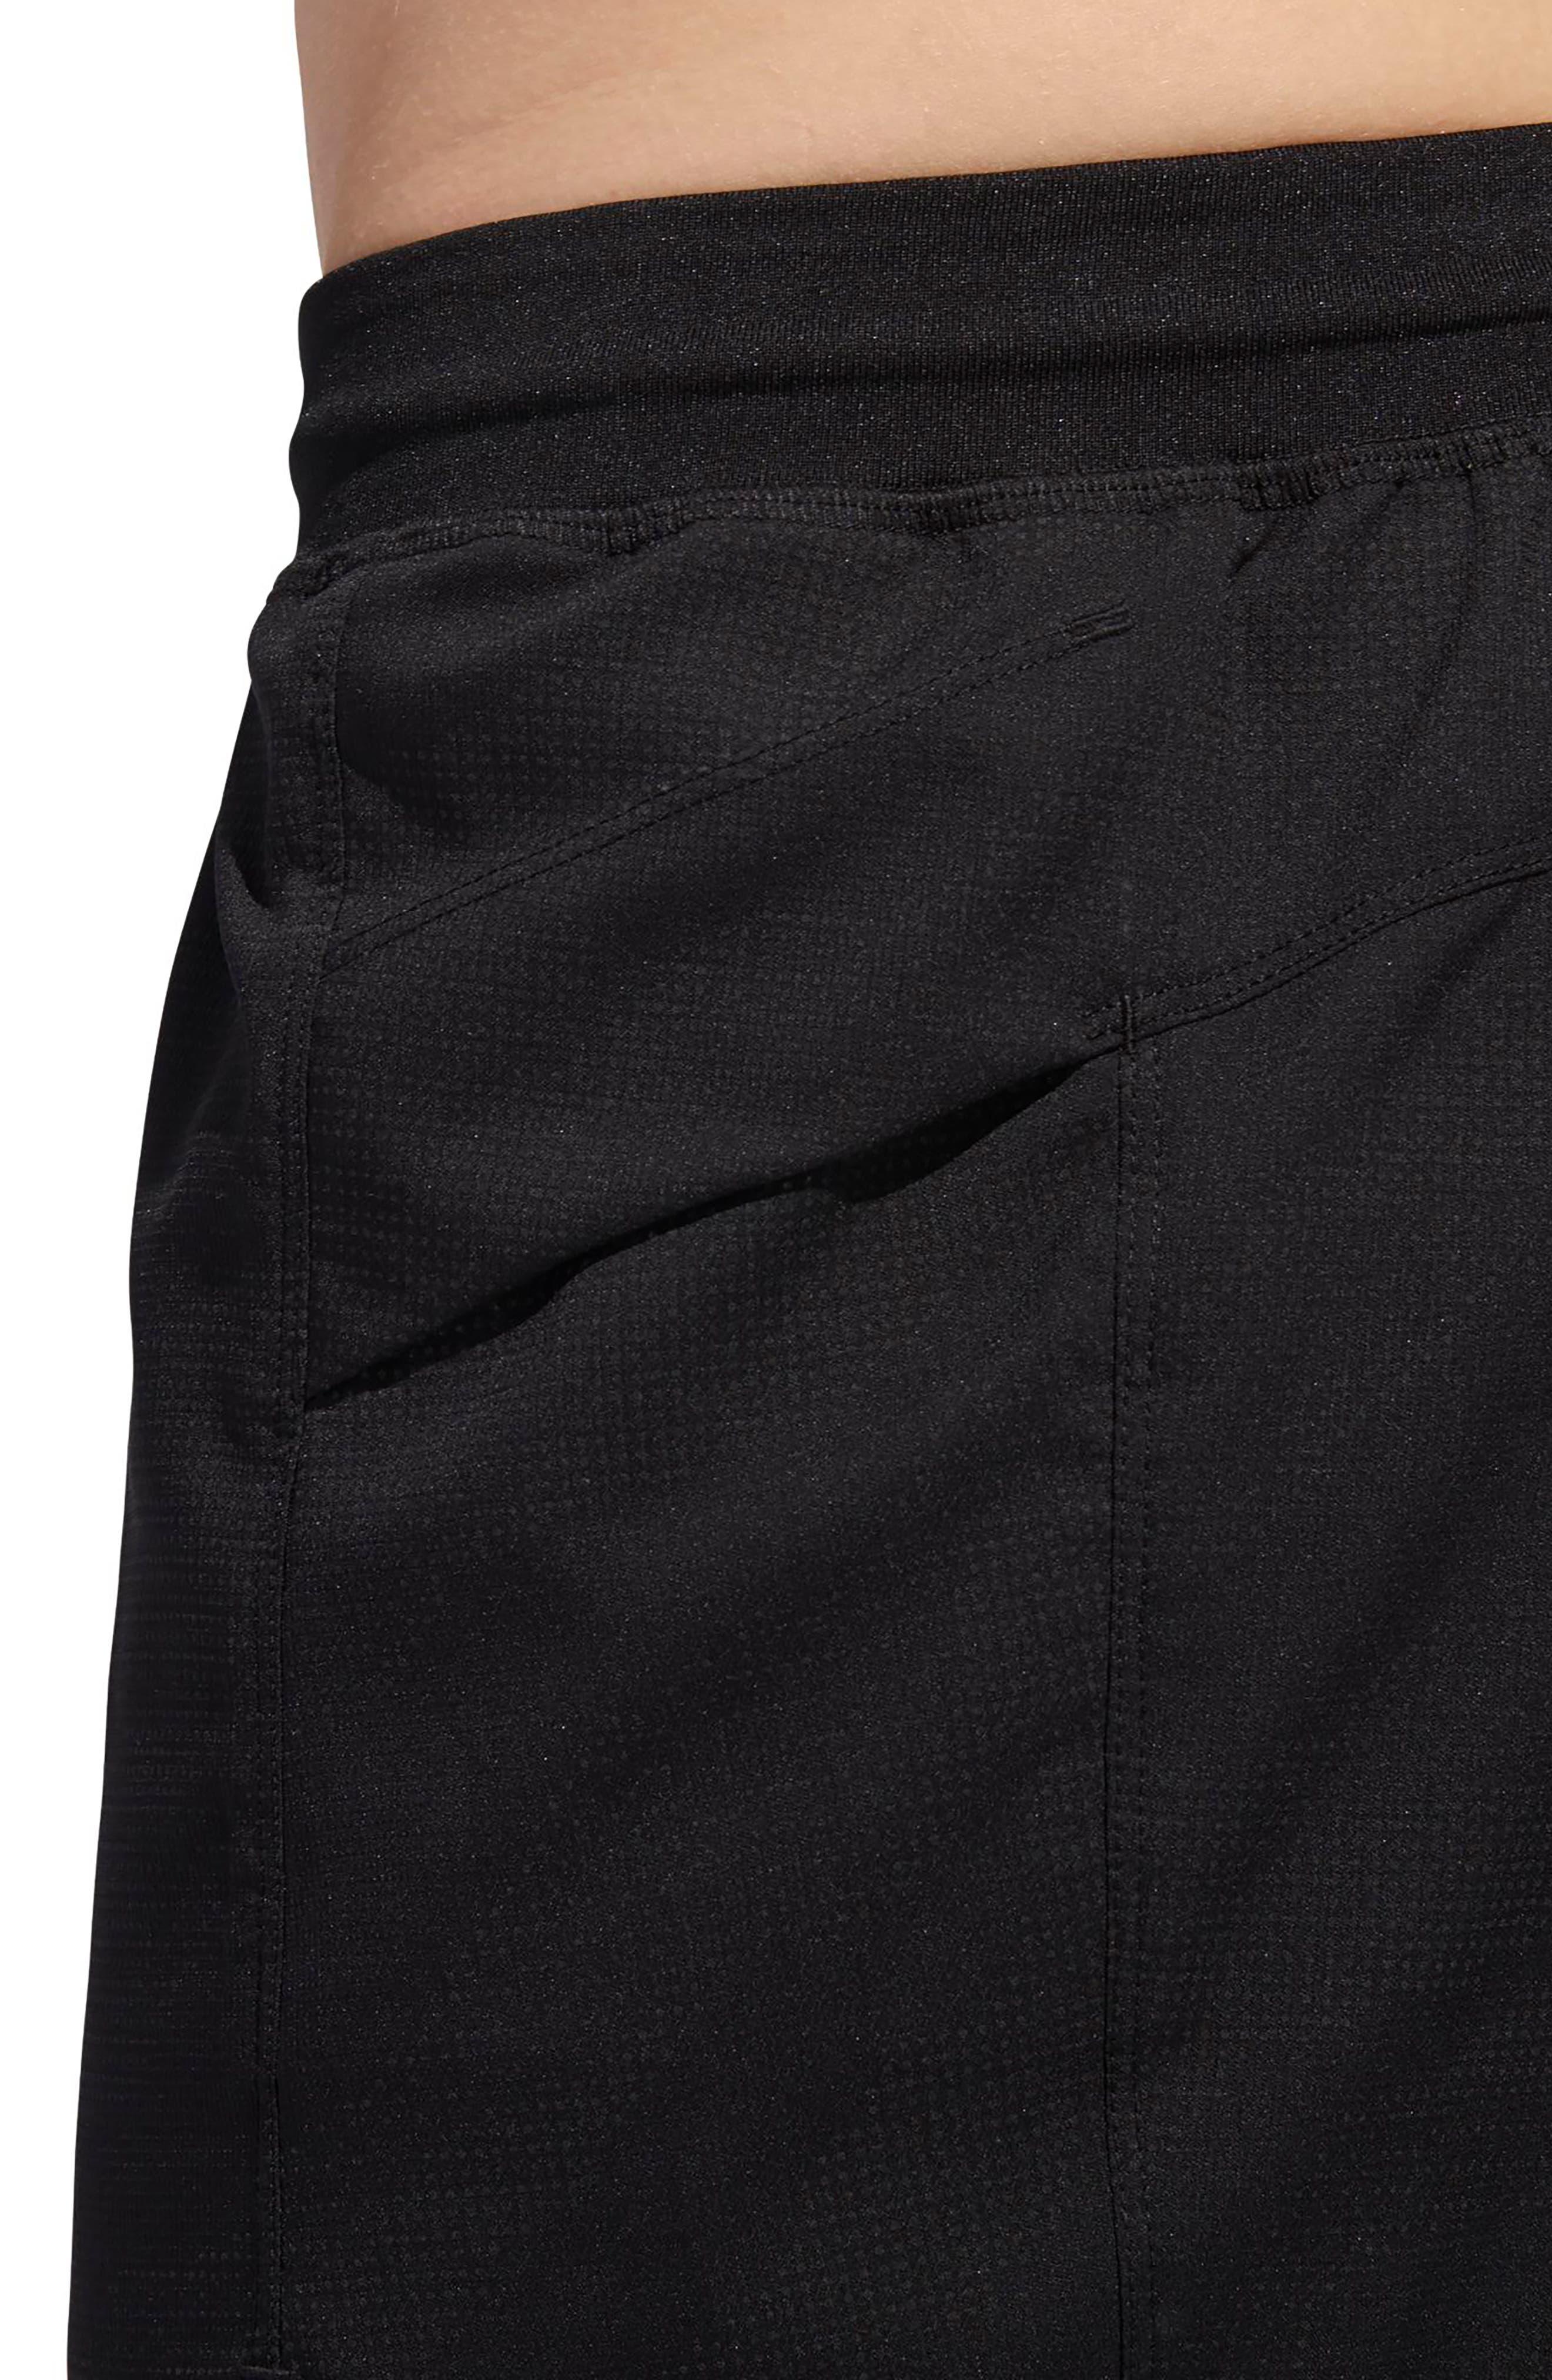 Camo Hype Reflective Regular Fit Shorts,                             Alternate thumbnail 7, color,                             001